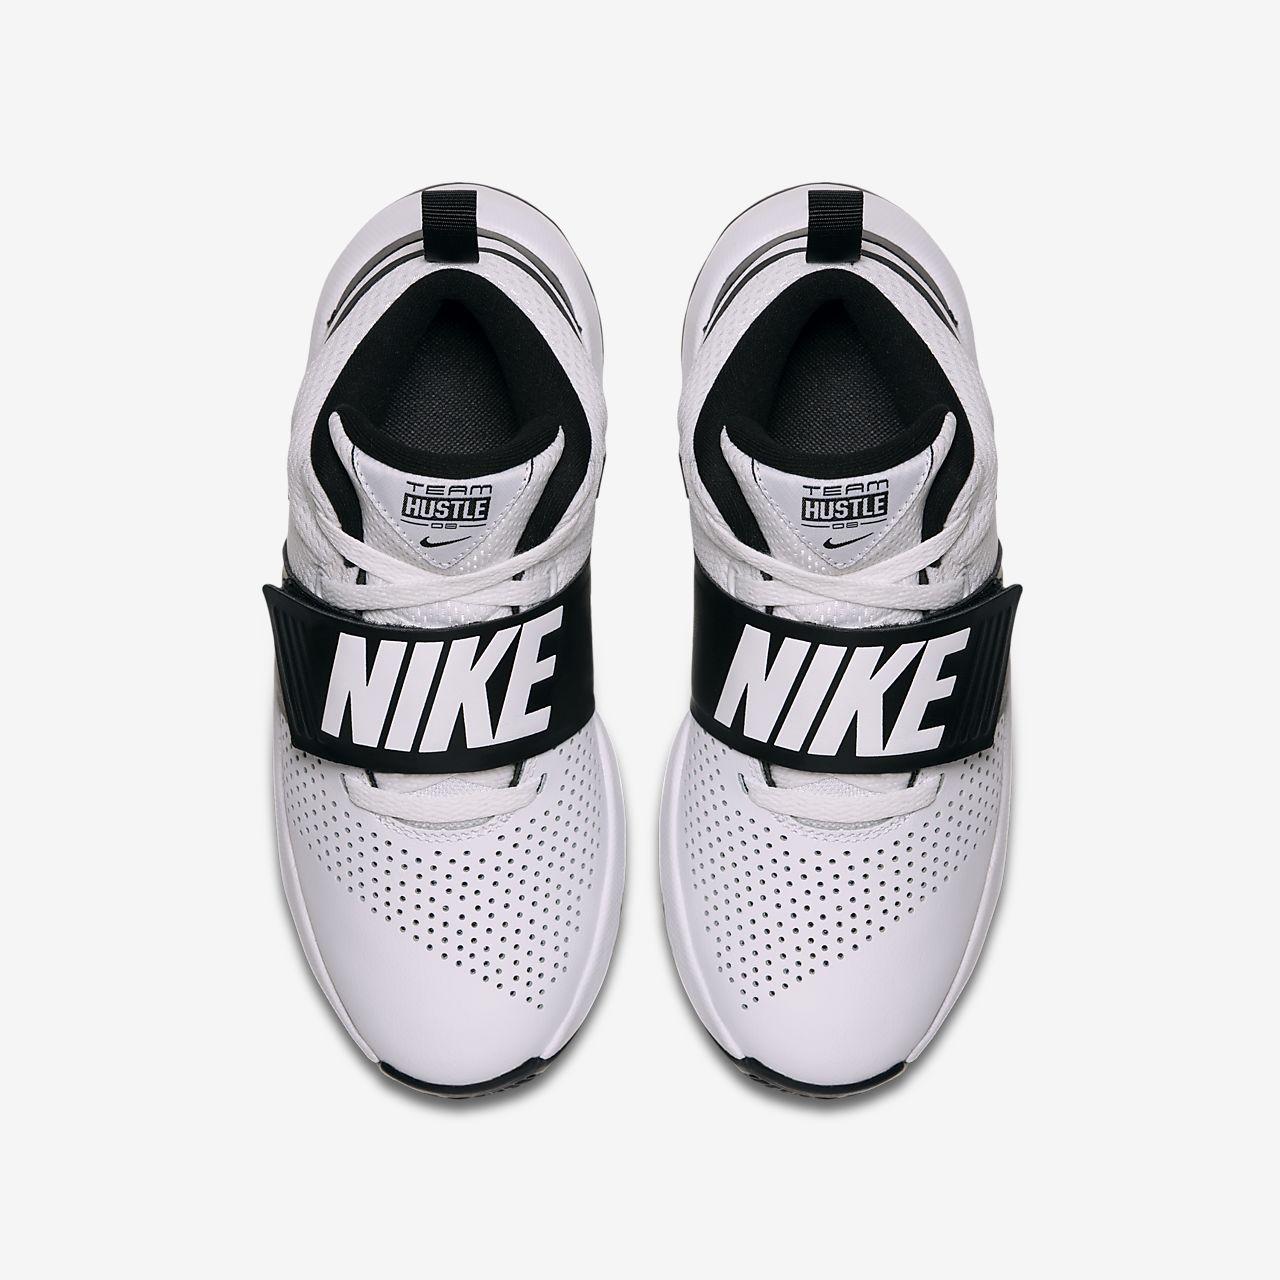 new style 9280f 4605f ... Nike Team Hustle D 8 Zapatillas de baloncesto - Niño a